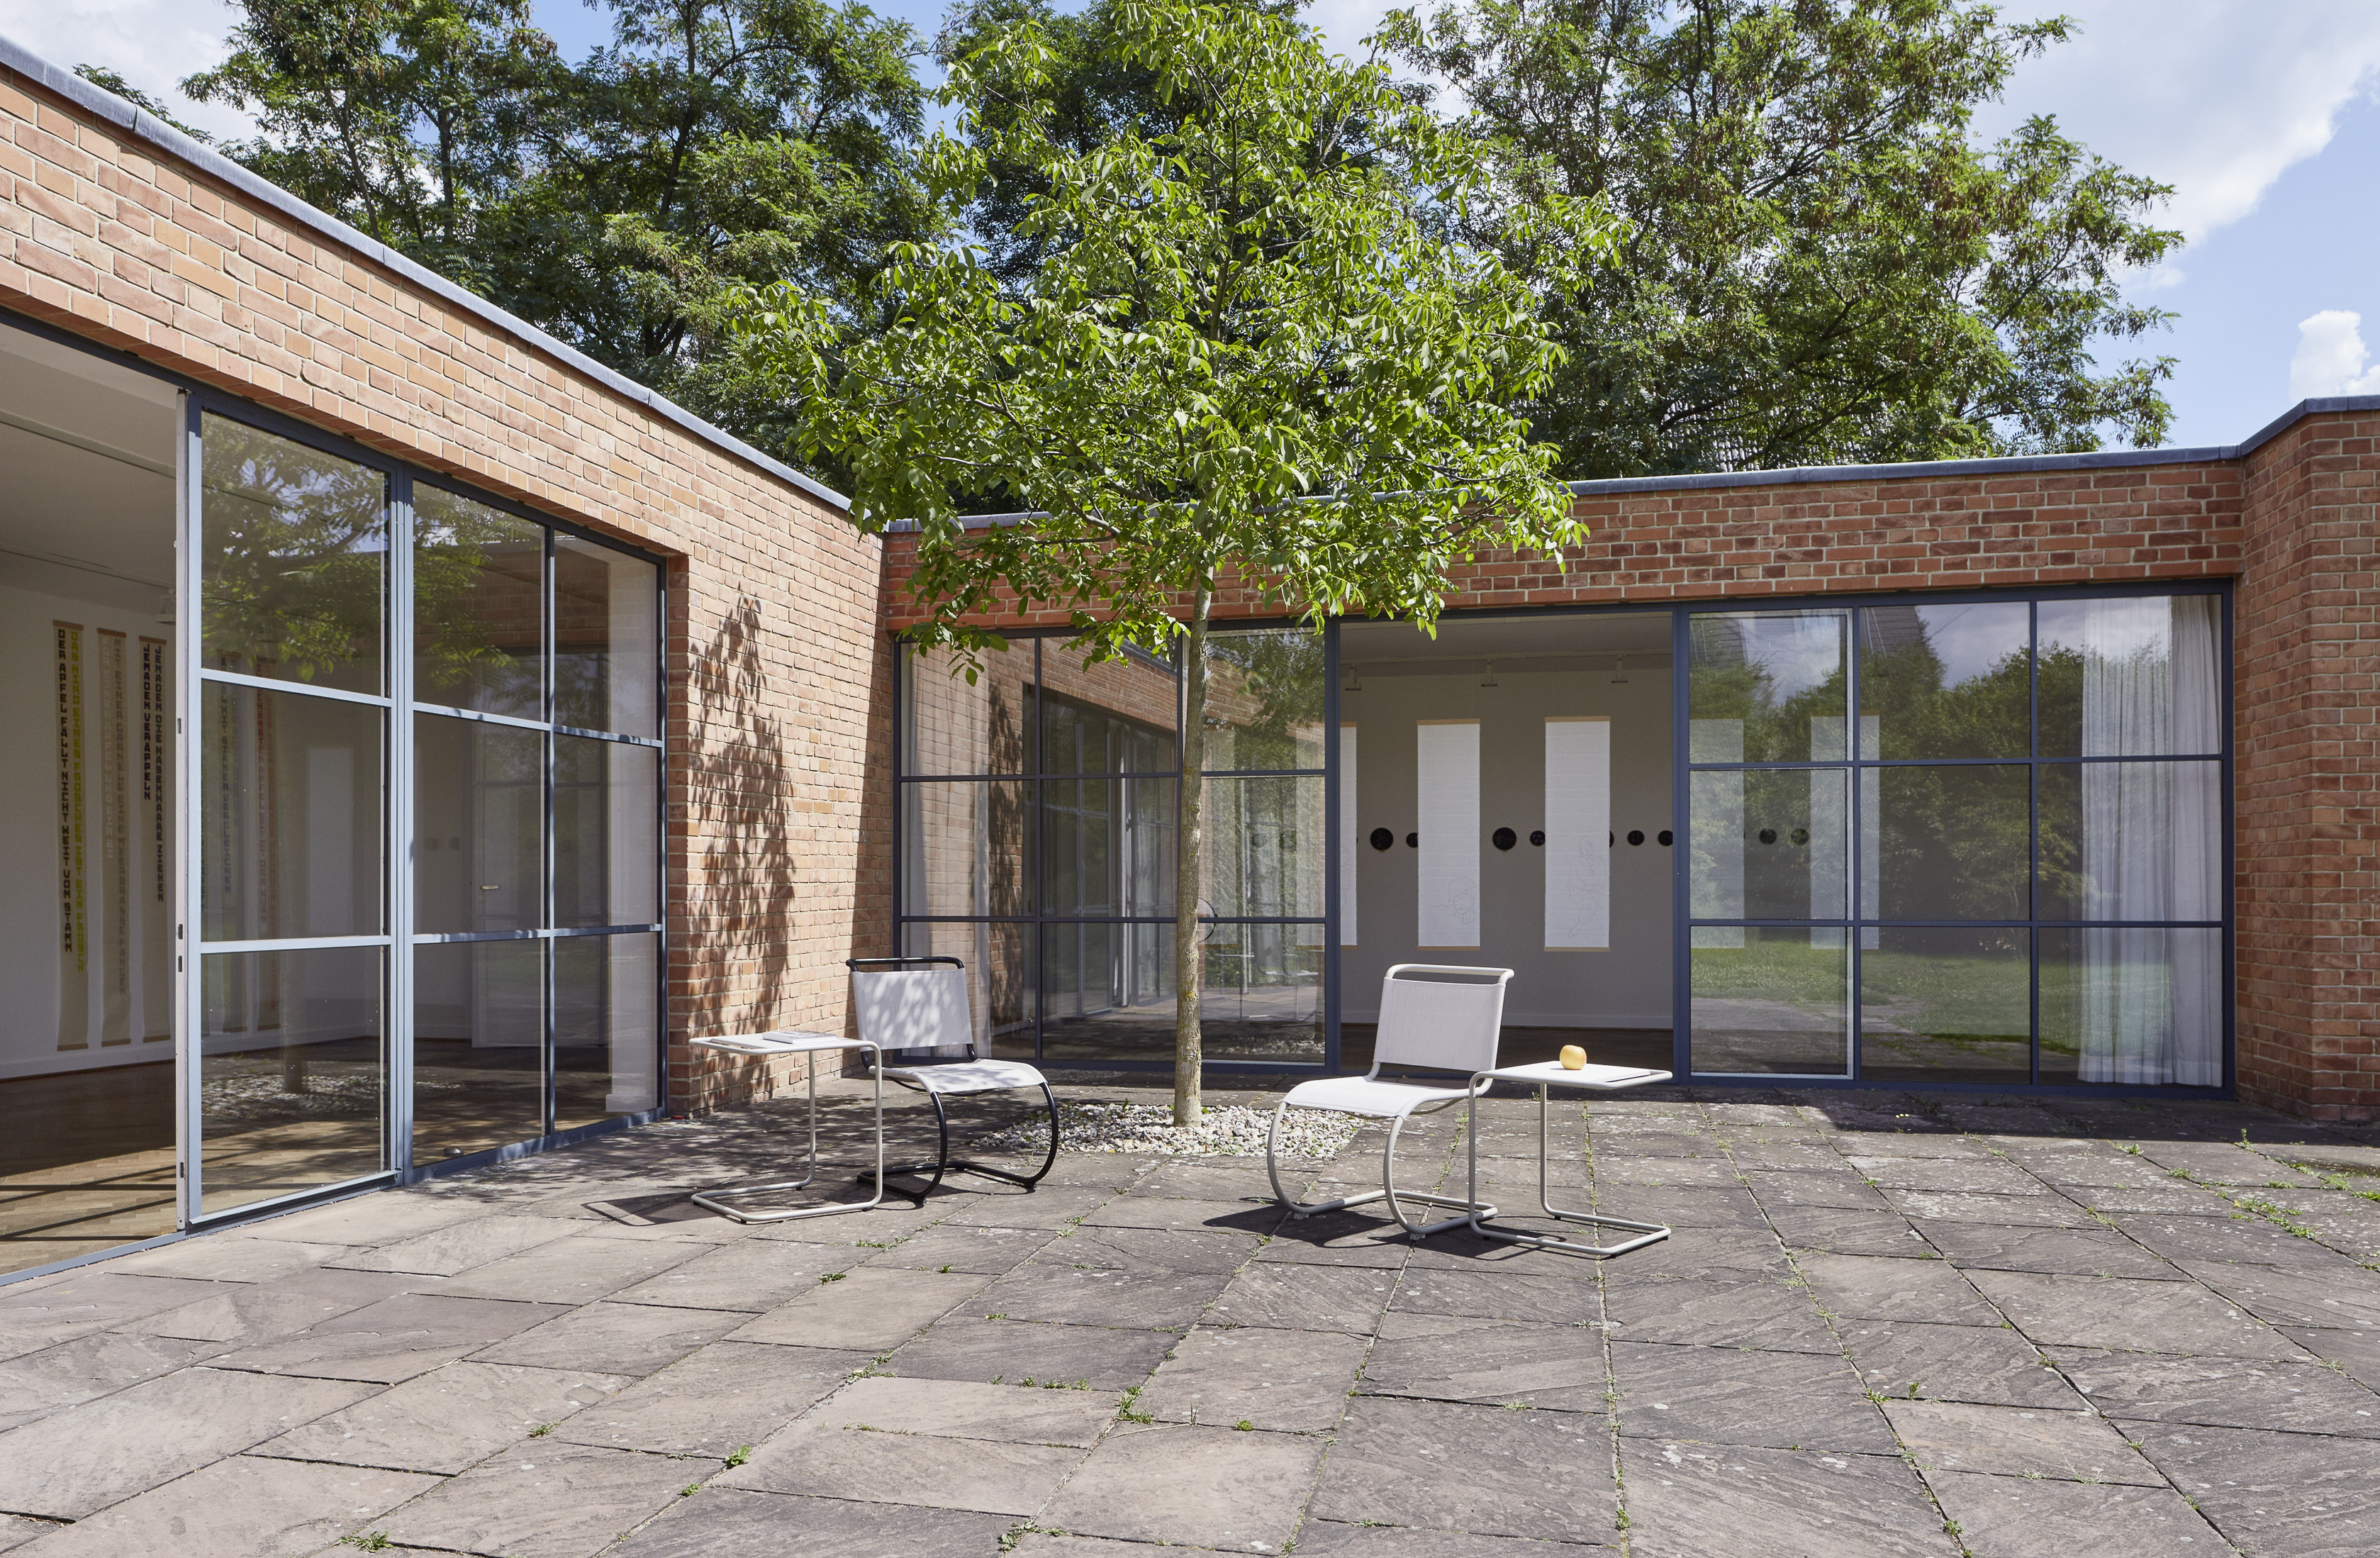 Mies van der Rohe Haus. Foto: Achim Hatzius 2019, Mies van der Rohe Haus